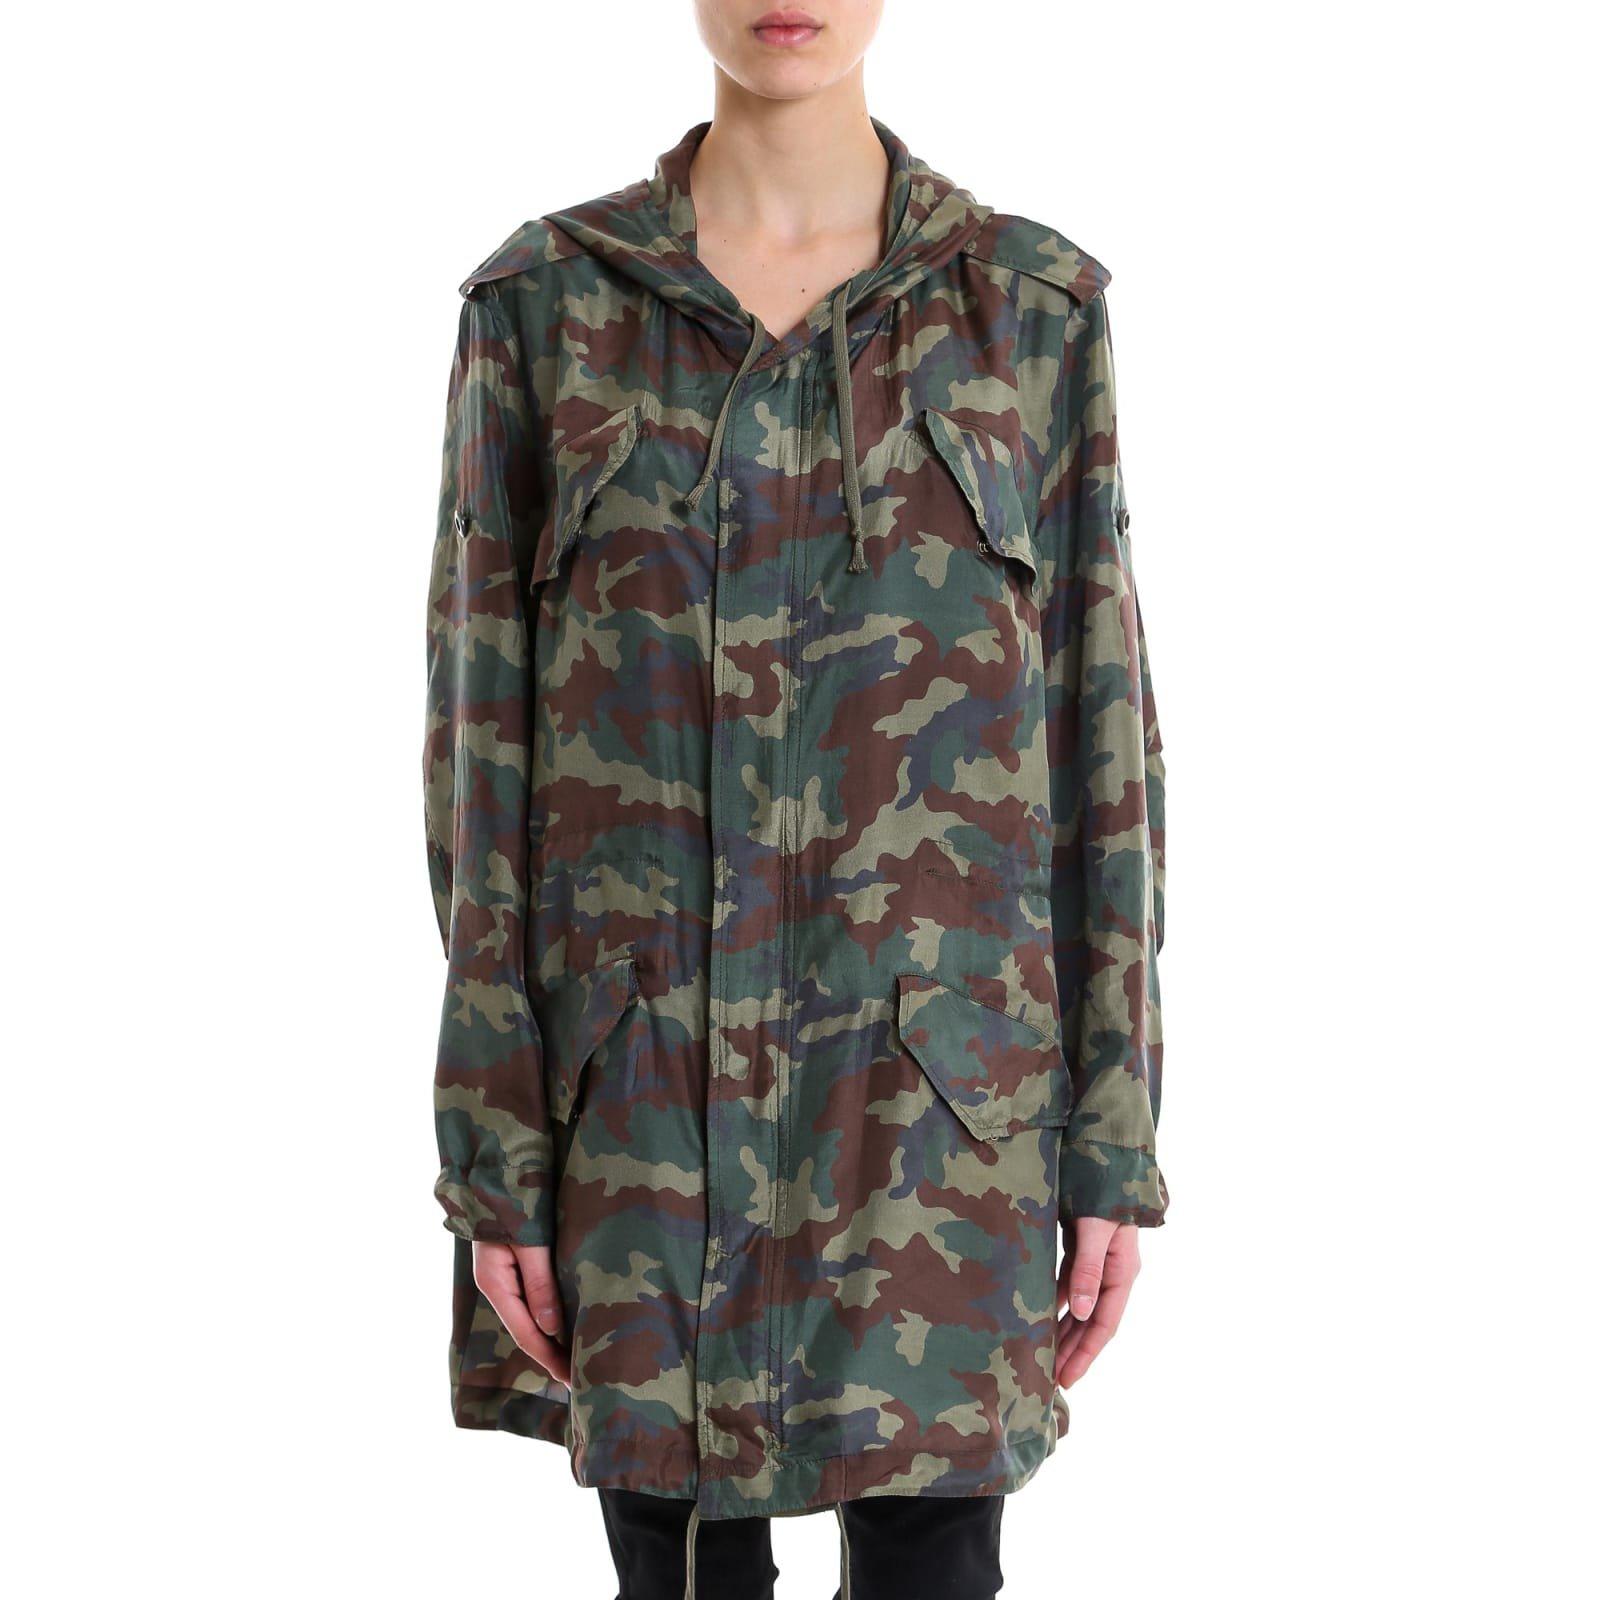 Faith Connexion Camo Silk Parka Dress Jacket